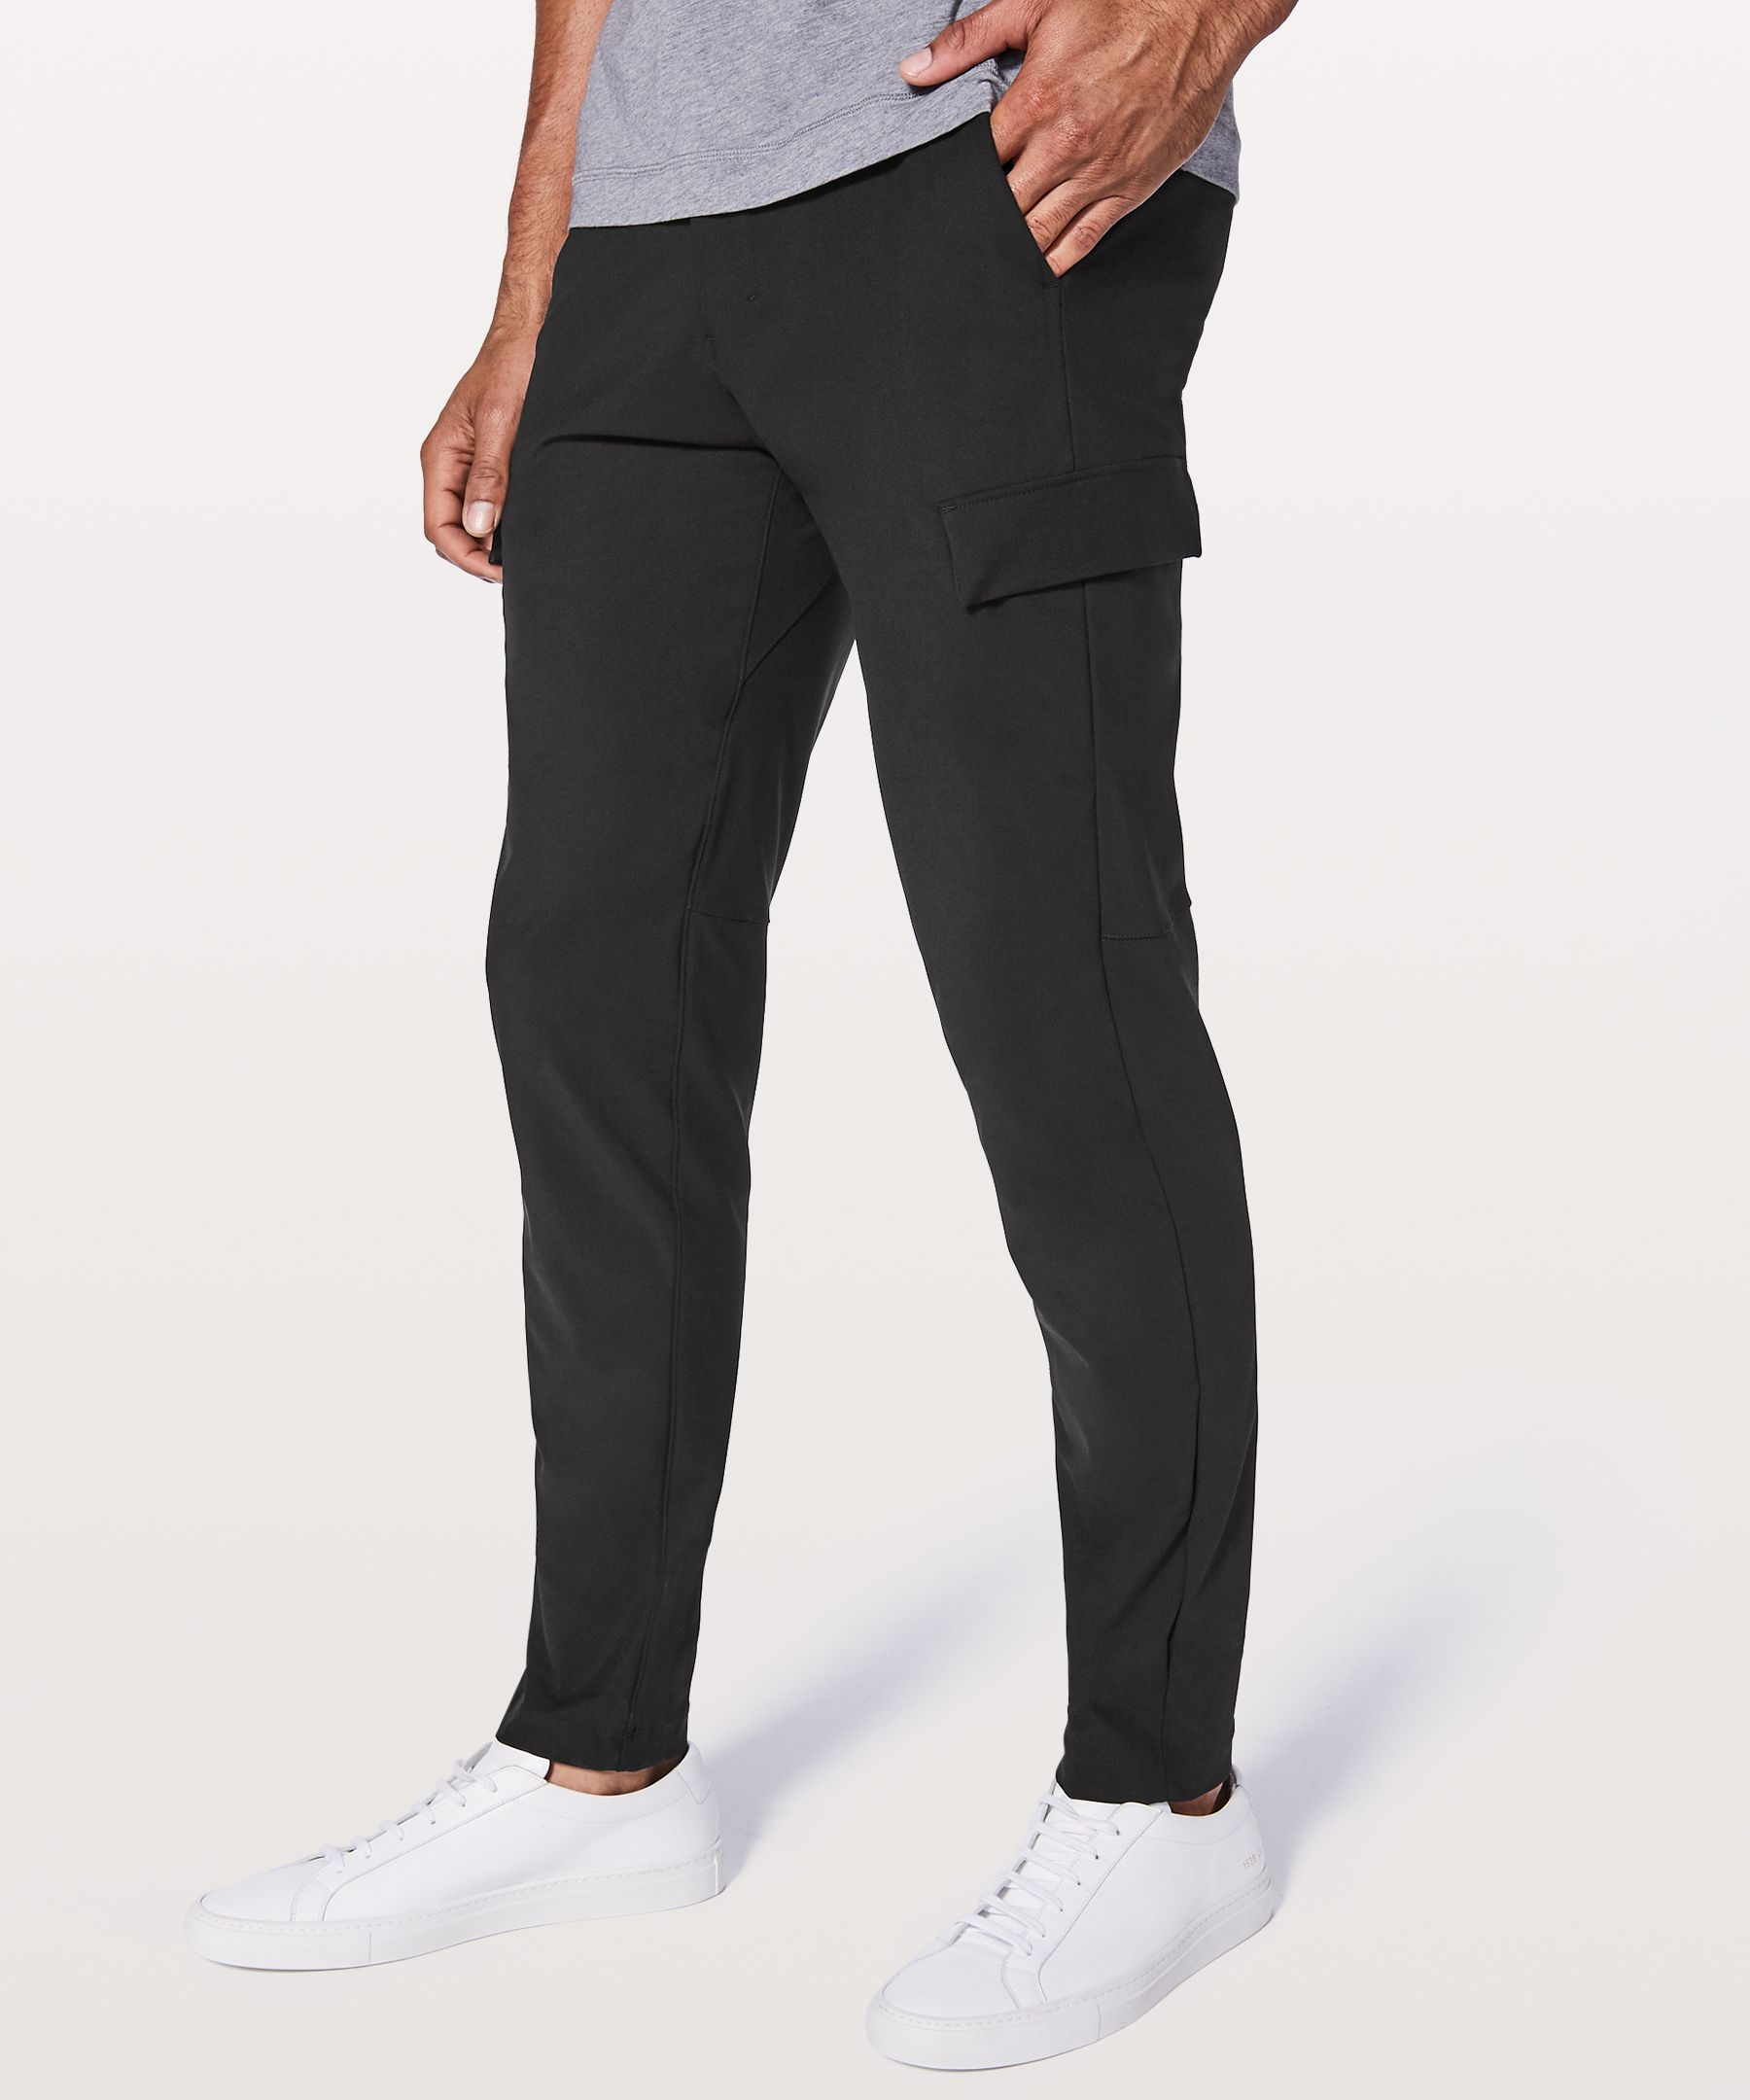 gap young girls yoga pants